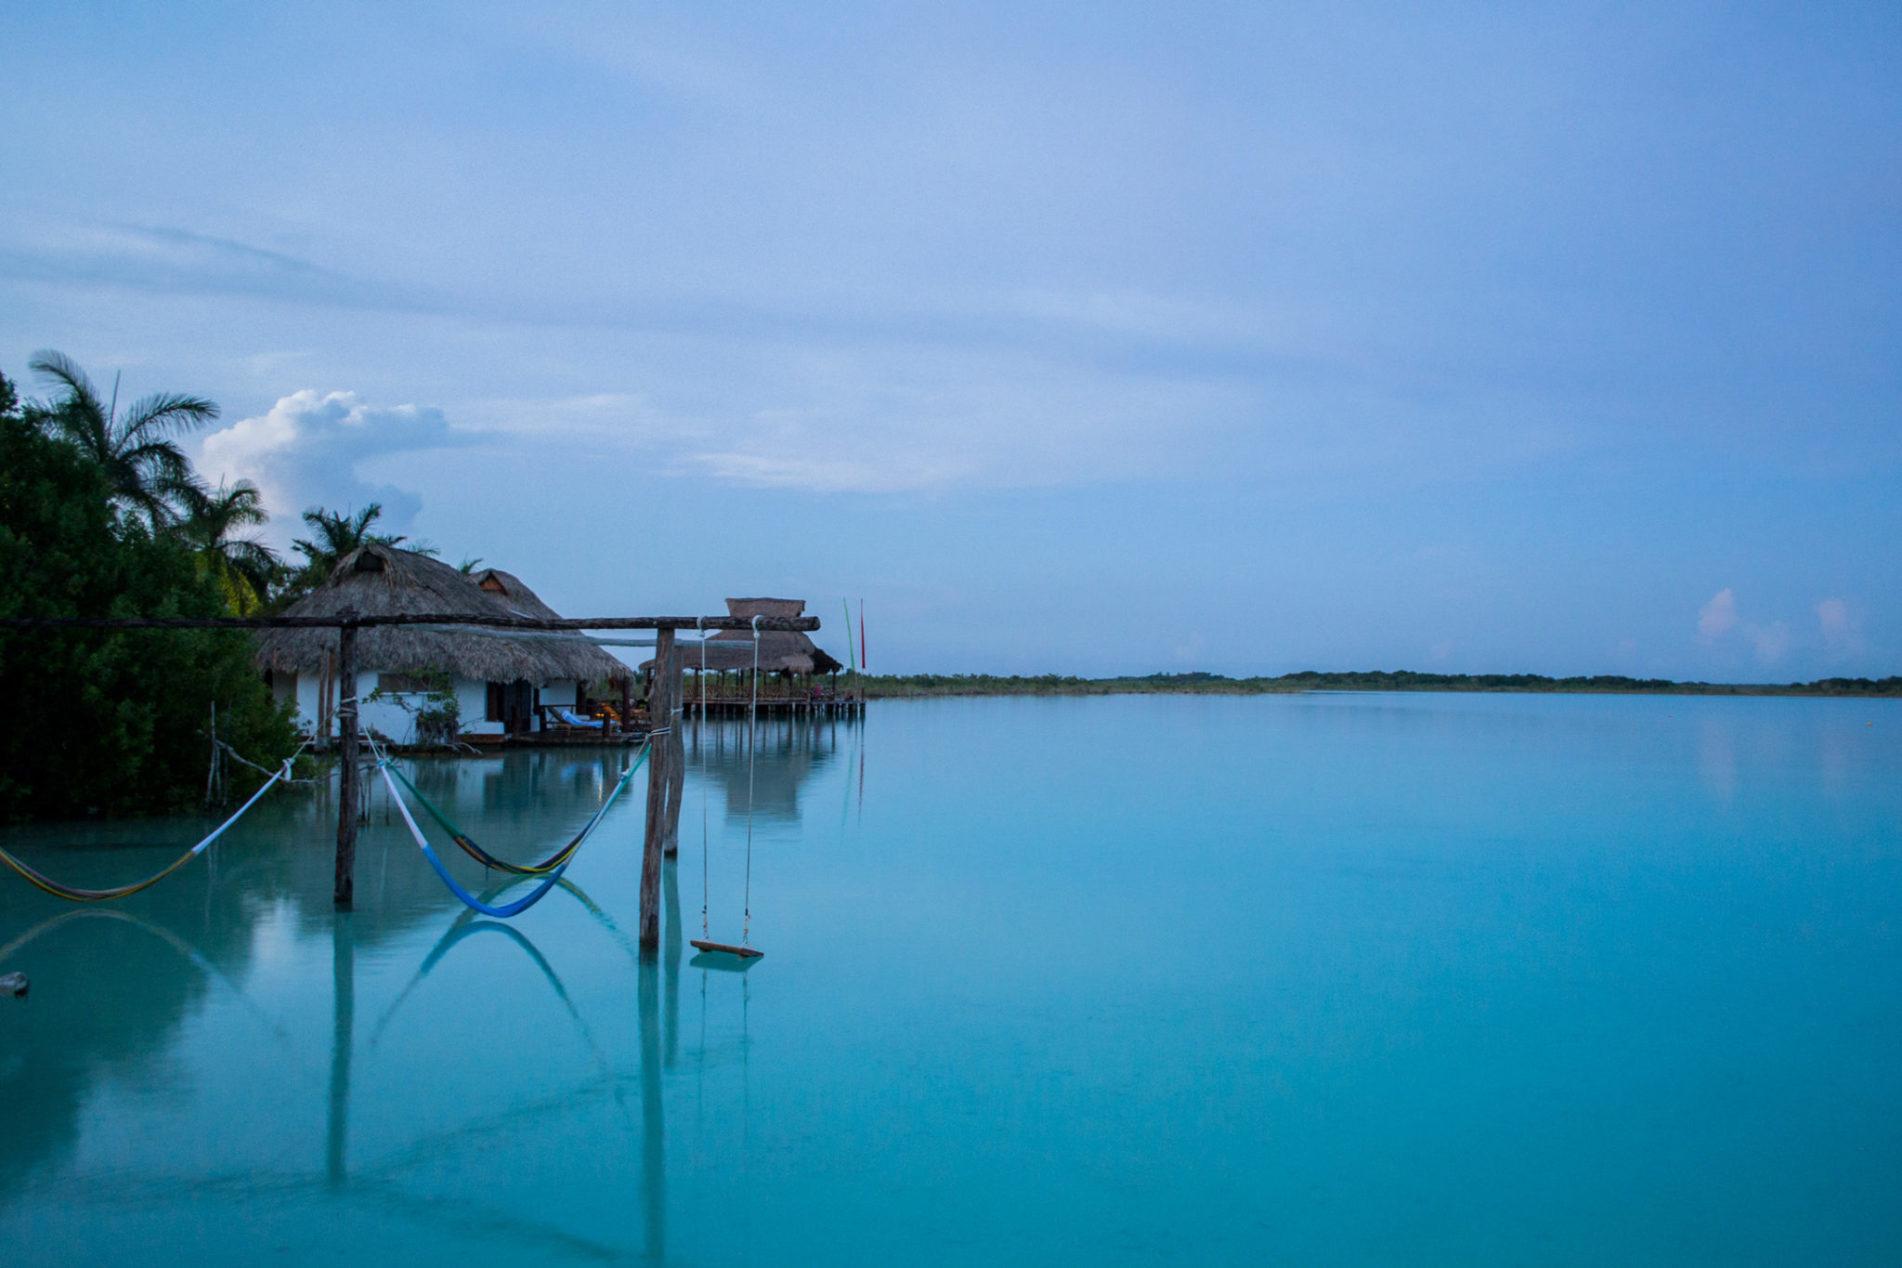 balançoires-hamac-lagune-bacalar-15-jours-au-yucatan